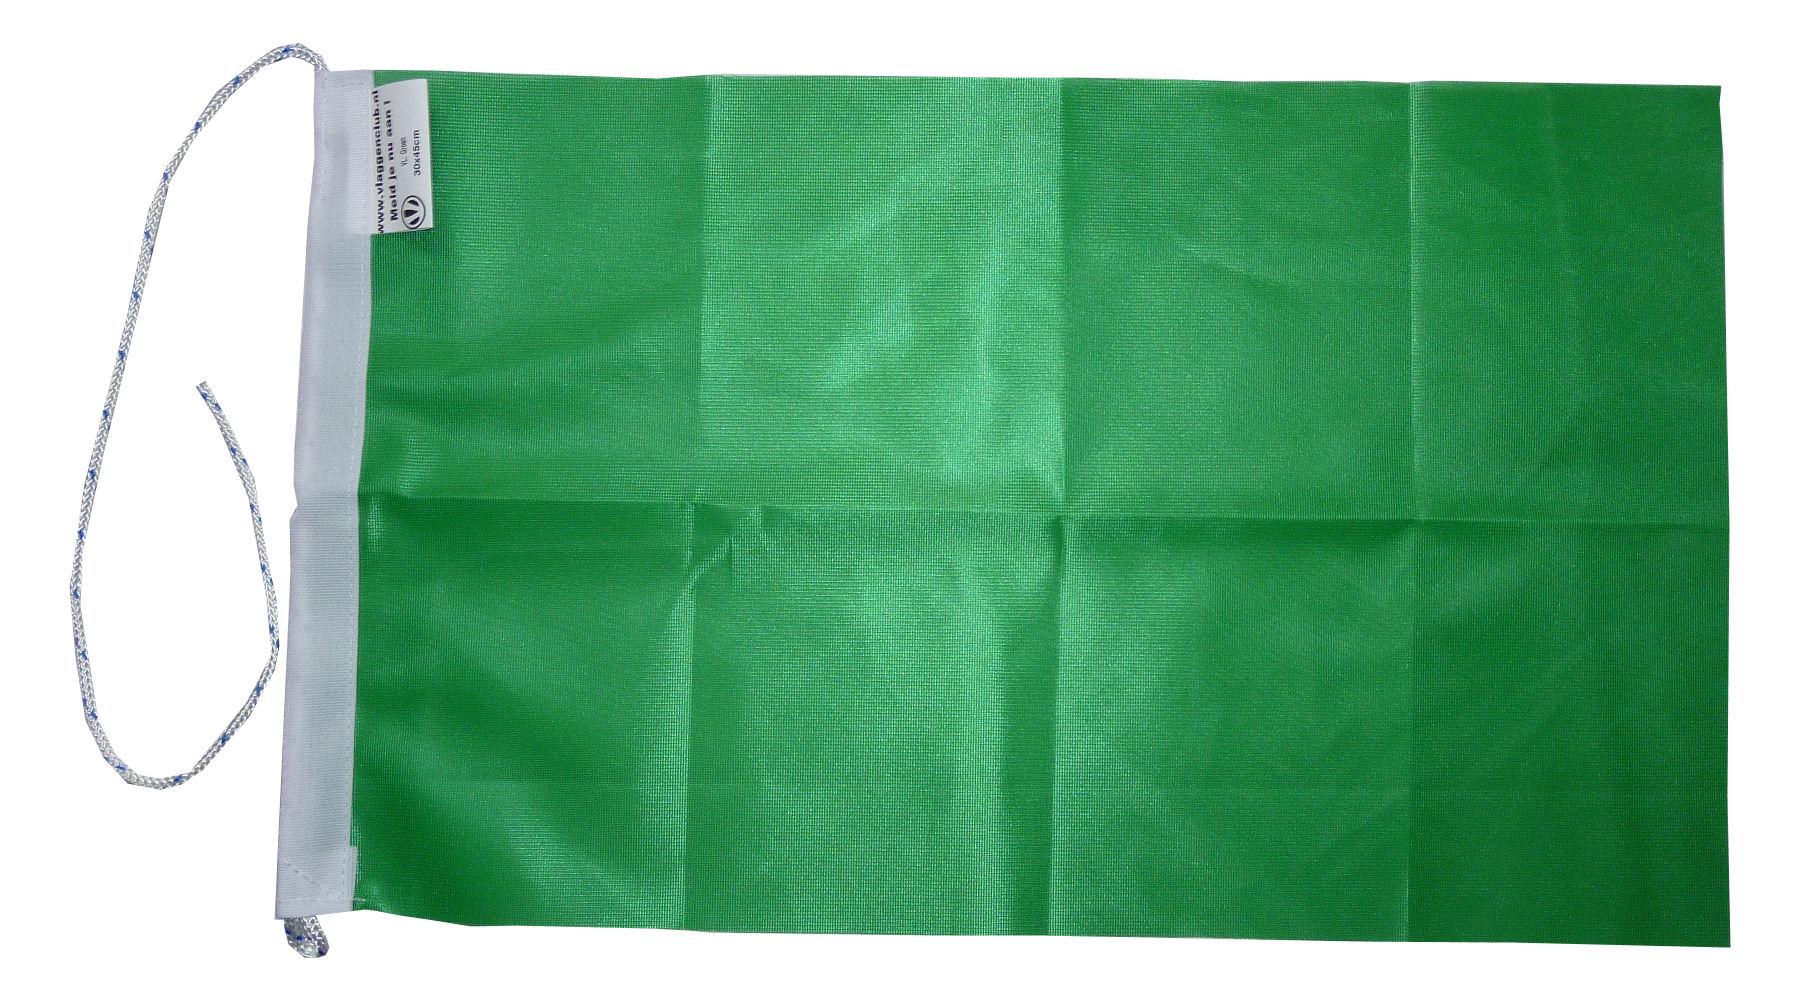 Groene vlag rechthoekig 20x30cm